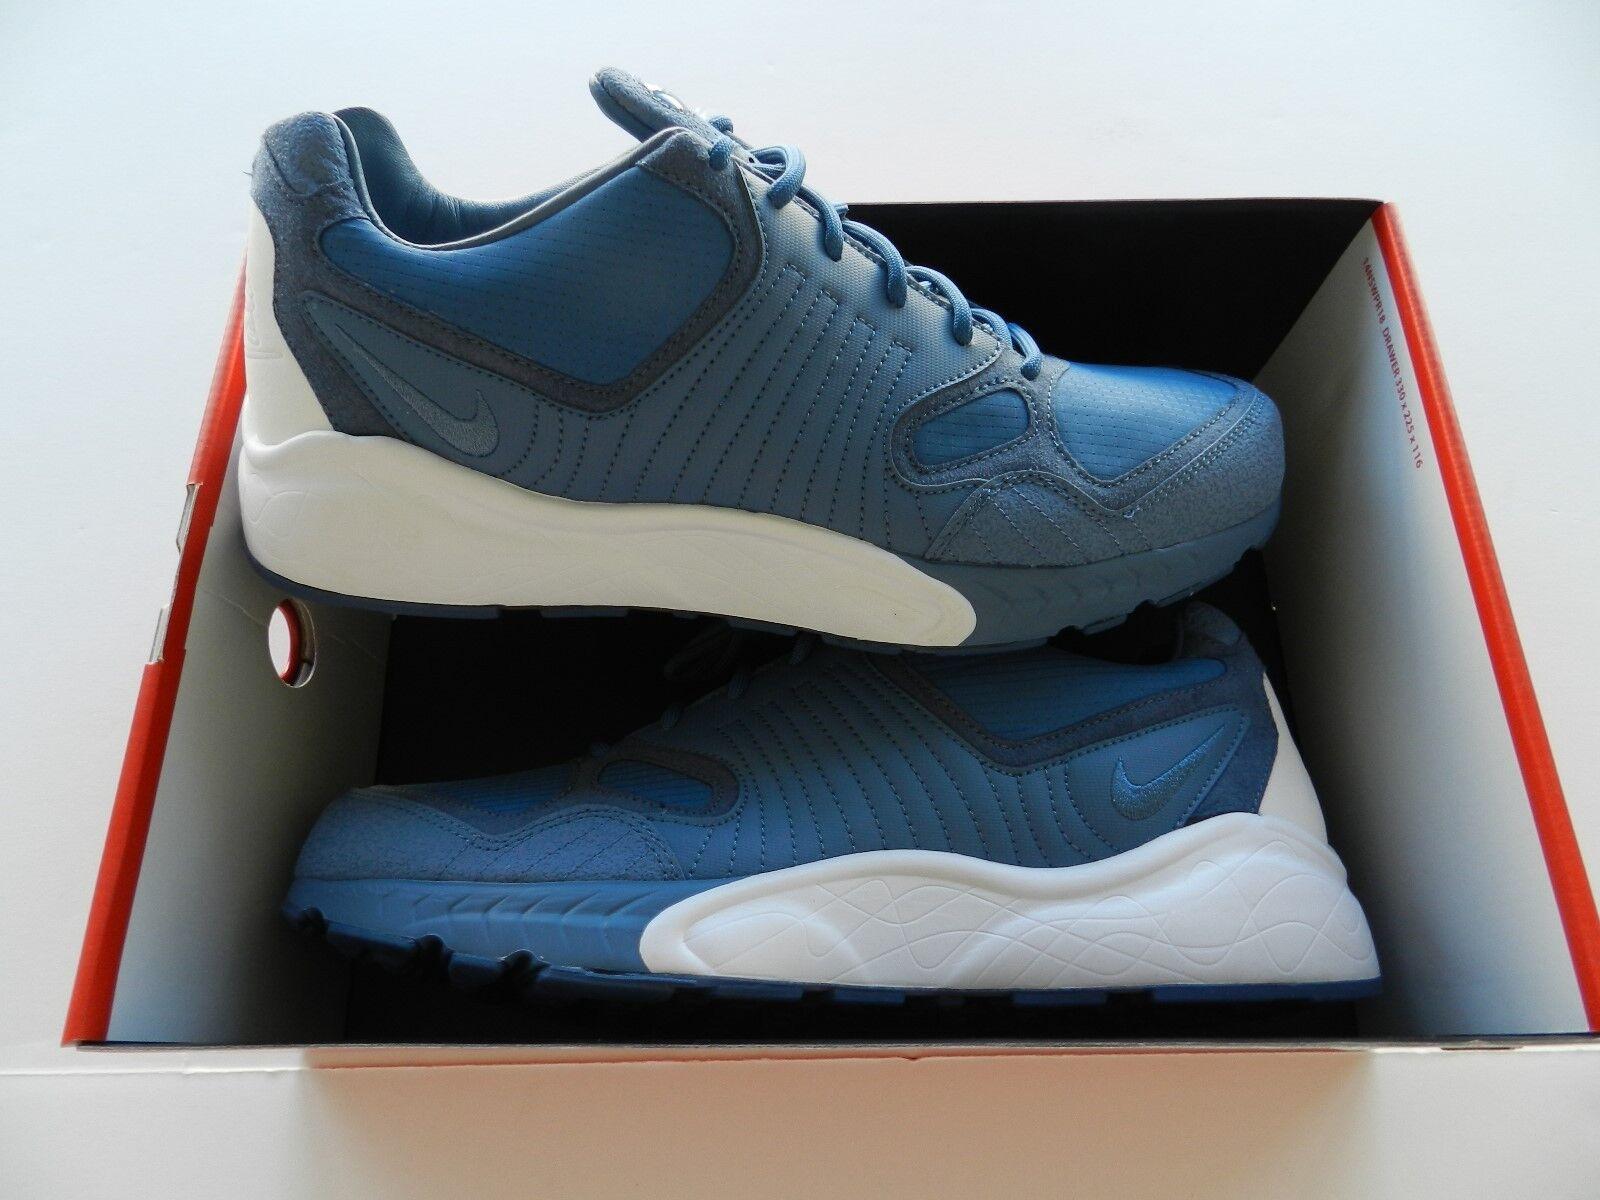 NIKE Men's AIR ZOOM TALARIA '16 Athletic shoes 844695 400 bluee White sz 10.5